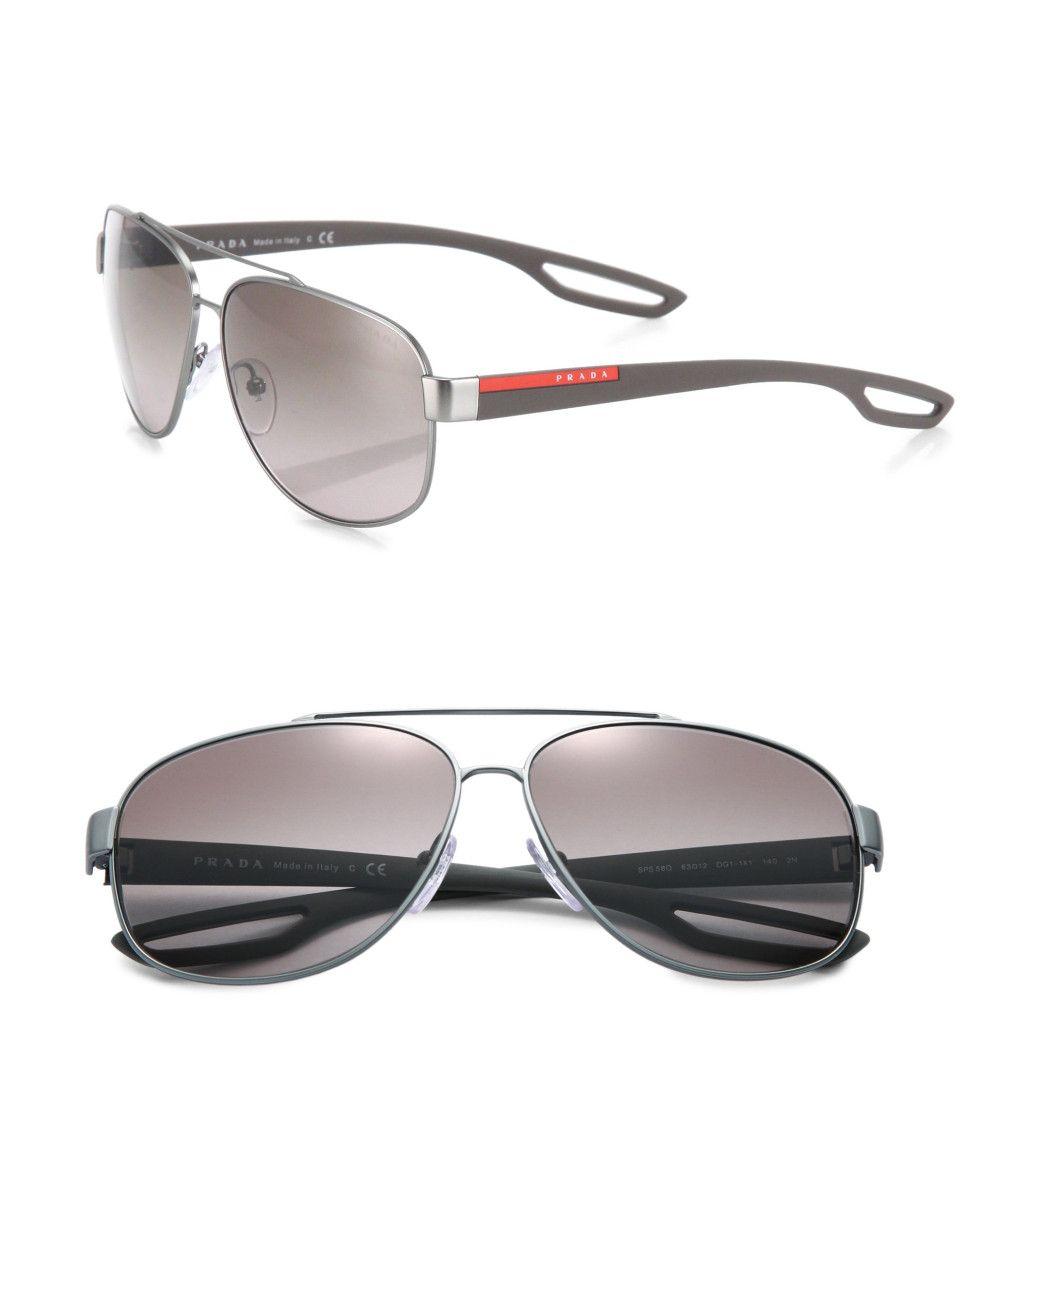 671c3106b25 Men s Metallic 63mm Rectangle Sunglasses